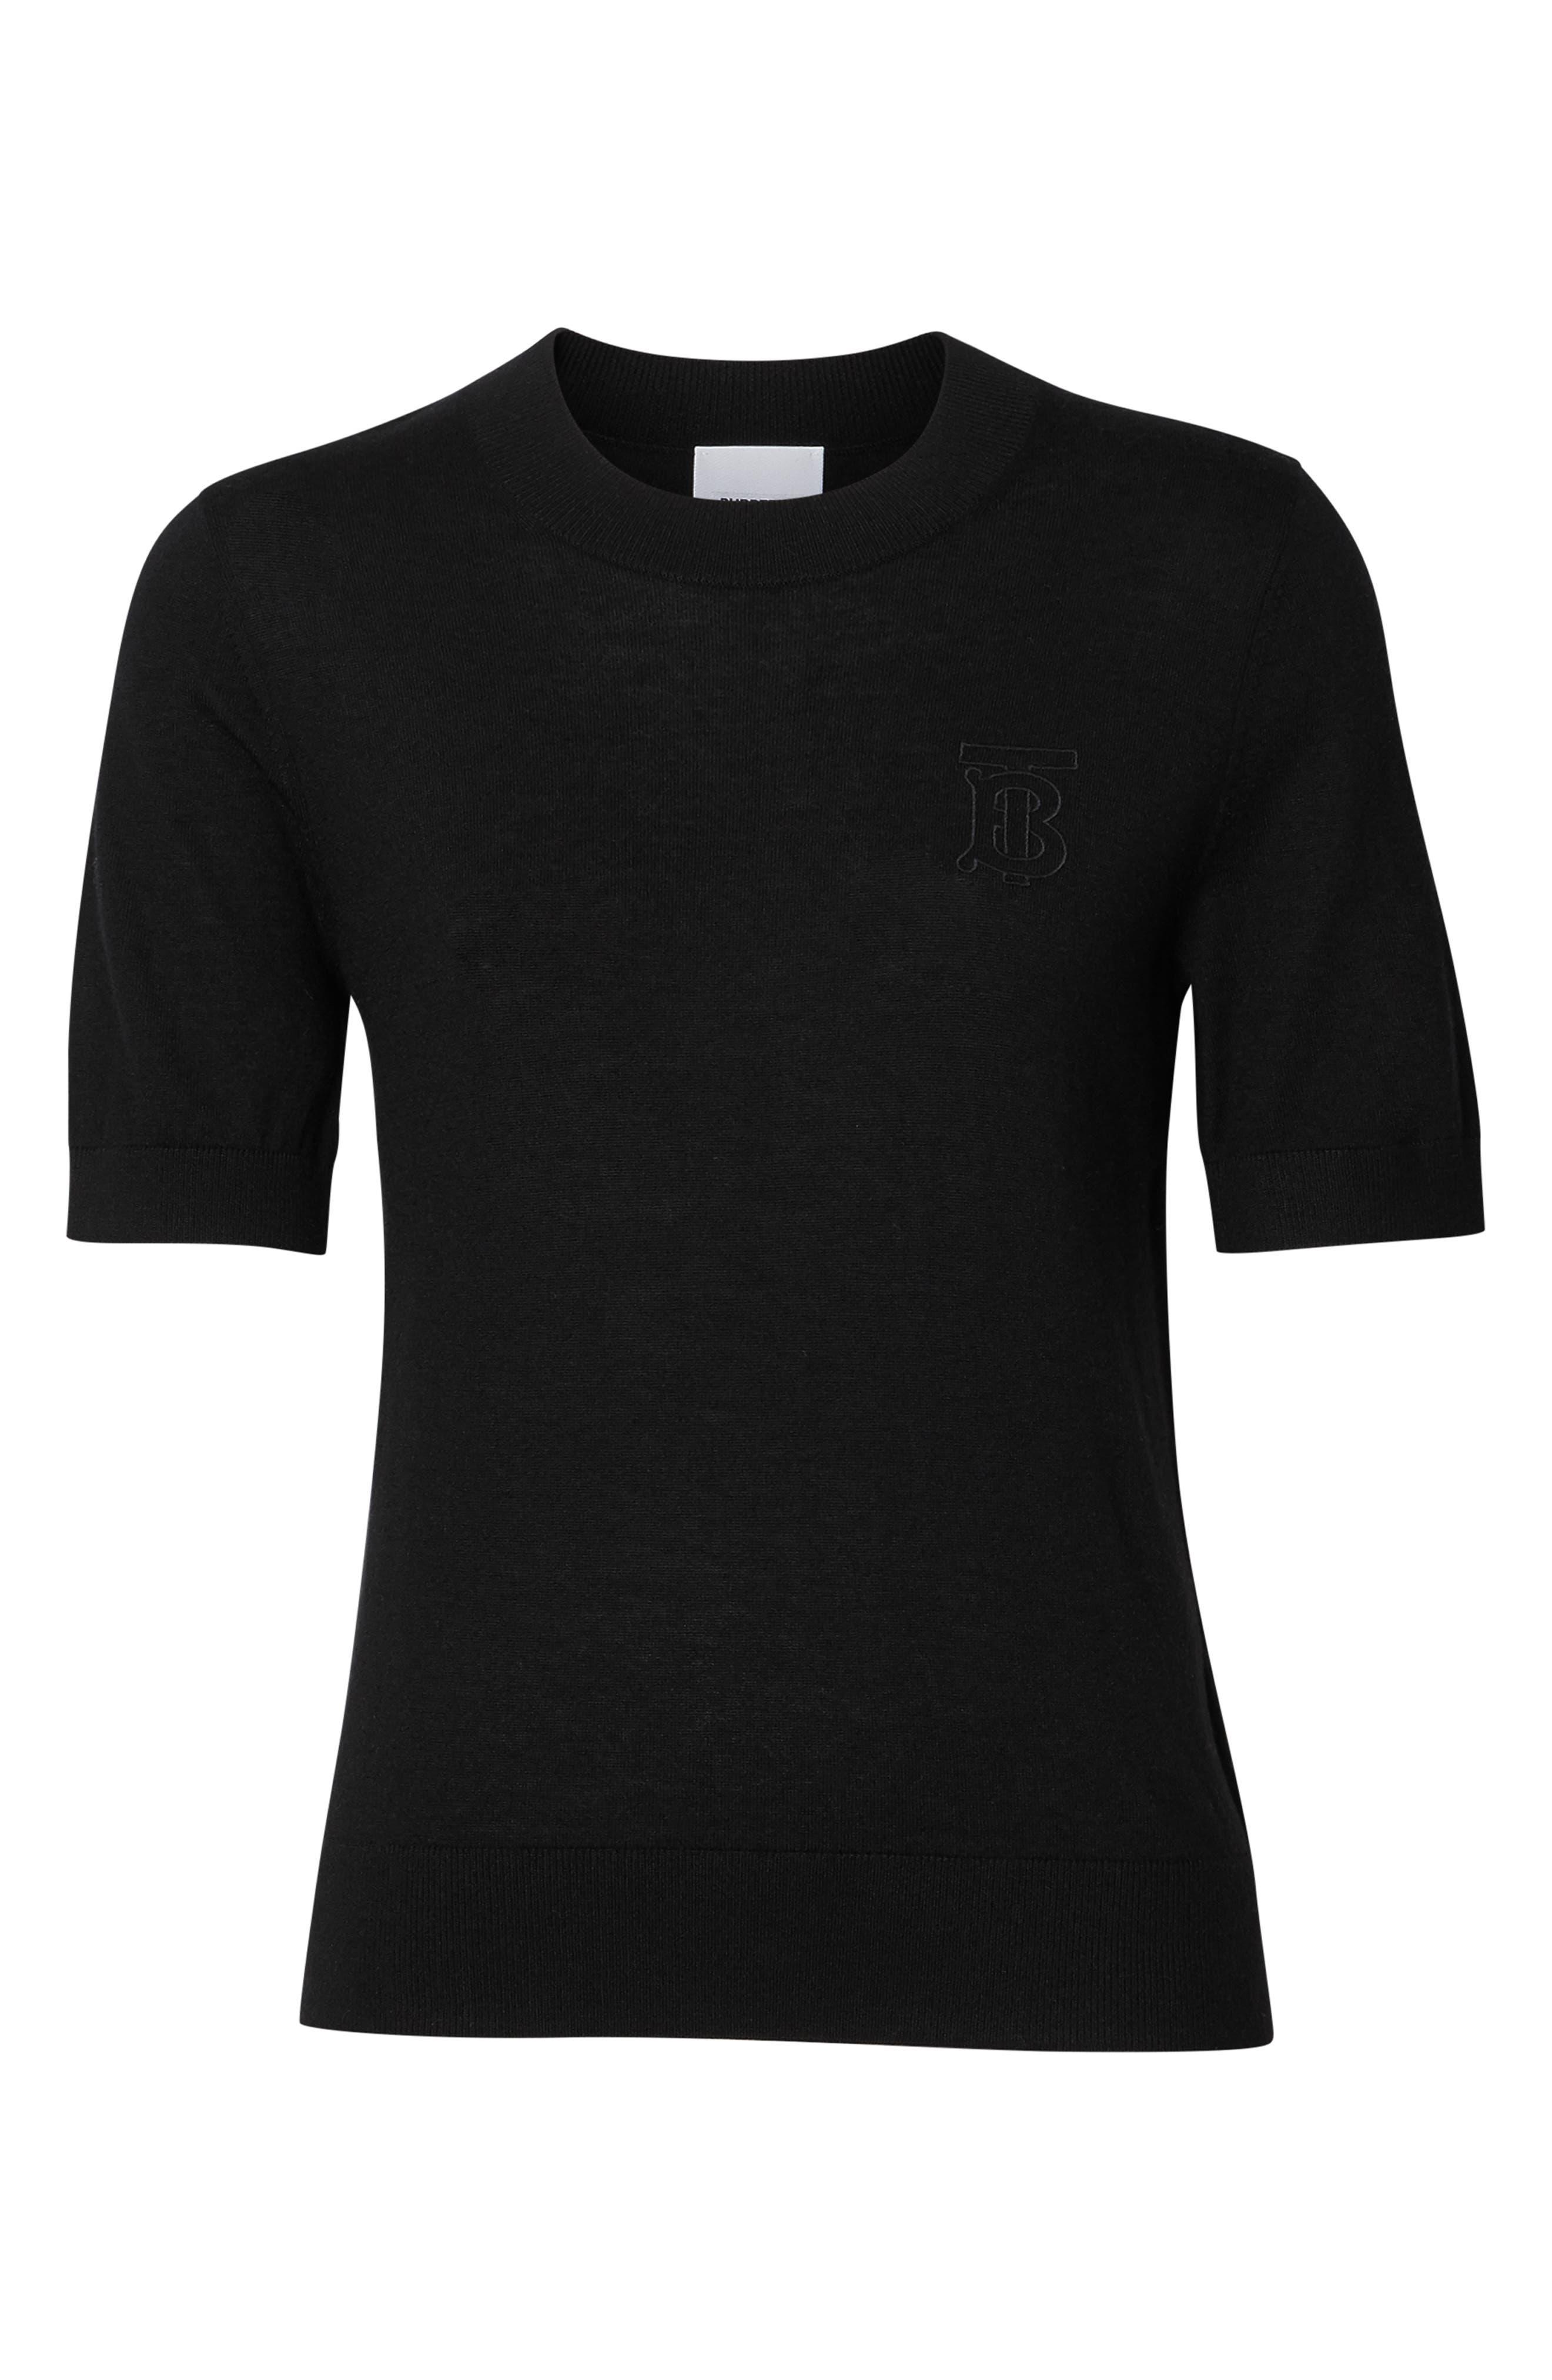 BURBERRY, Callery Monogram Logo Cashmere Sweater, Alternate thumbnail 5, color, BLACK